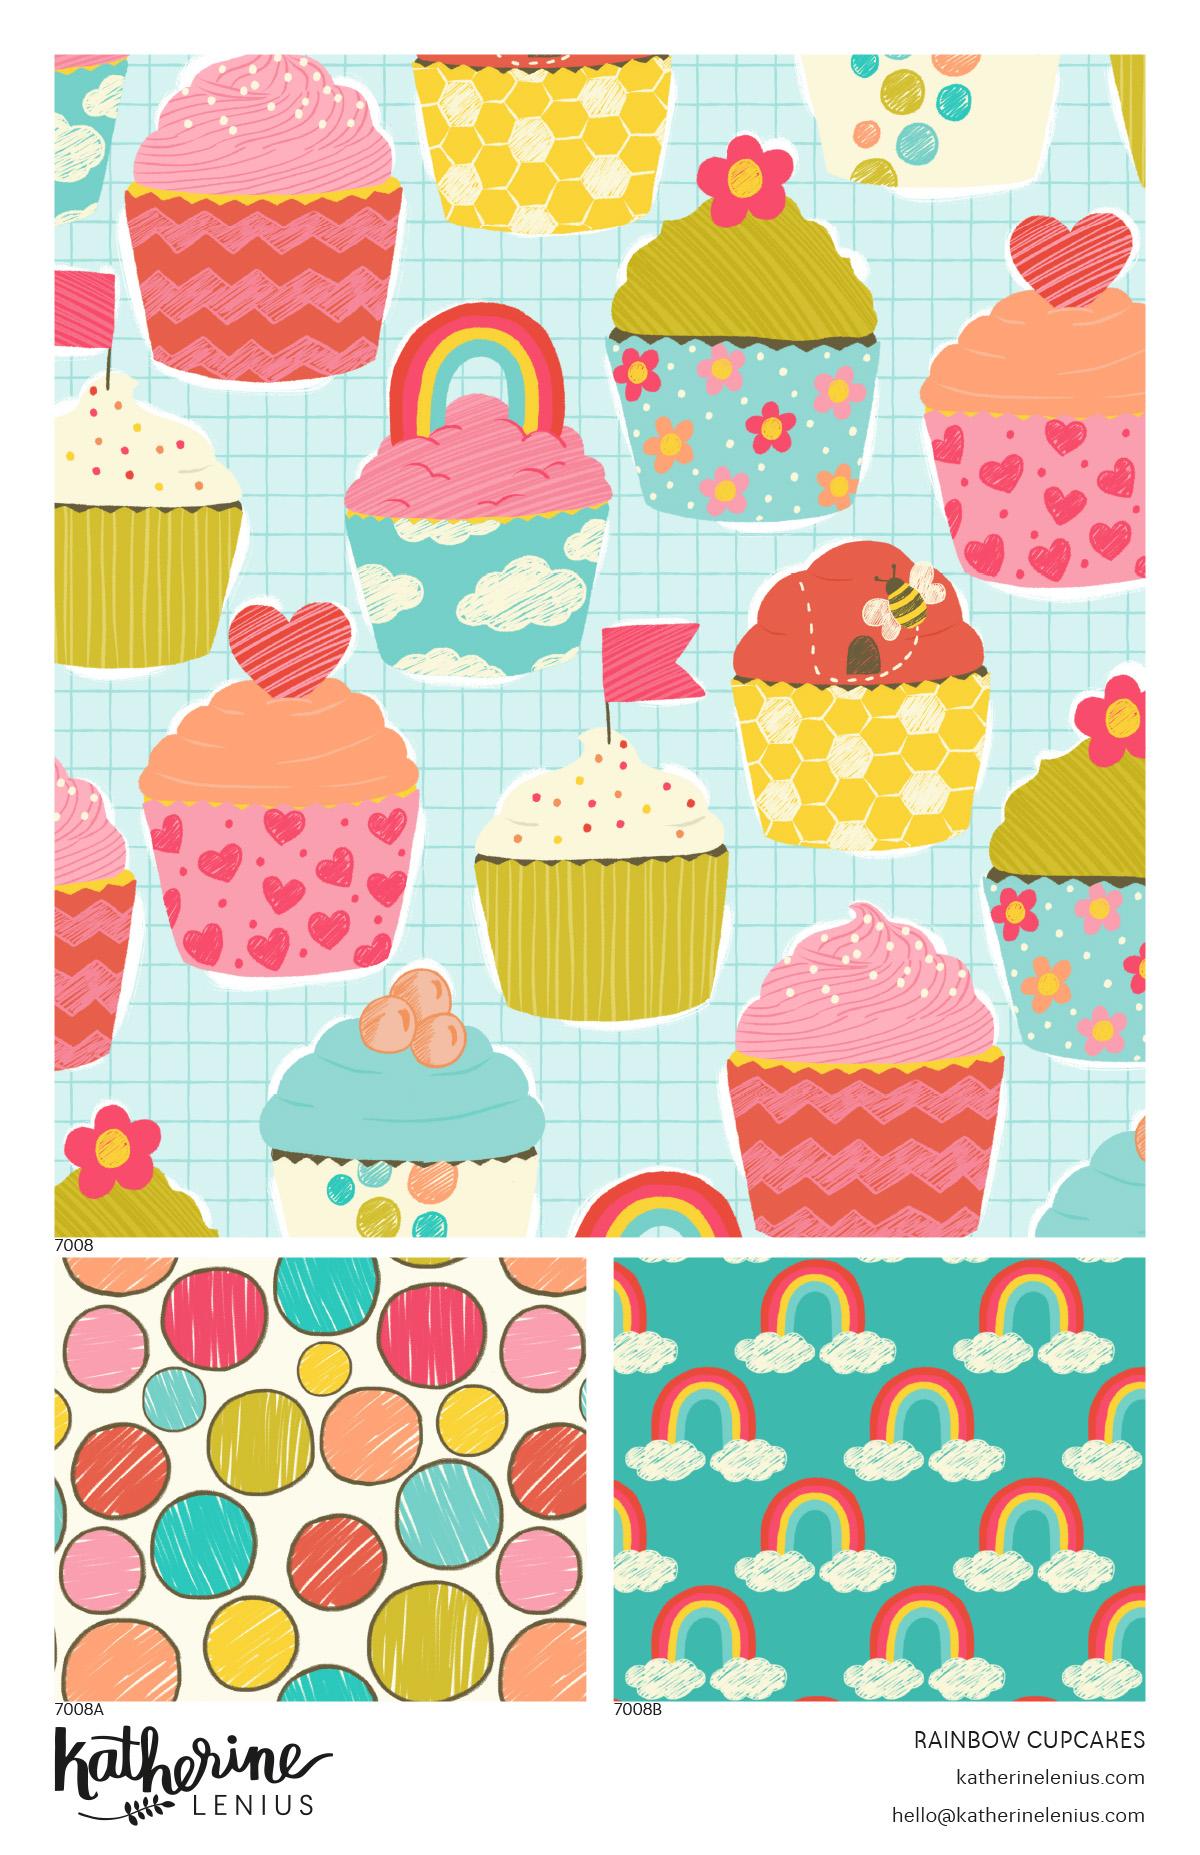 KL_7008_Rainbow Cupcakes copy.jpg